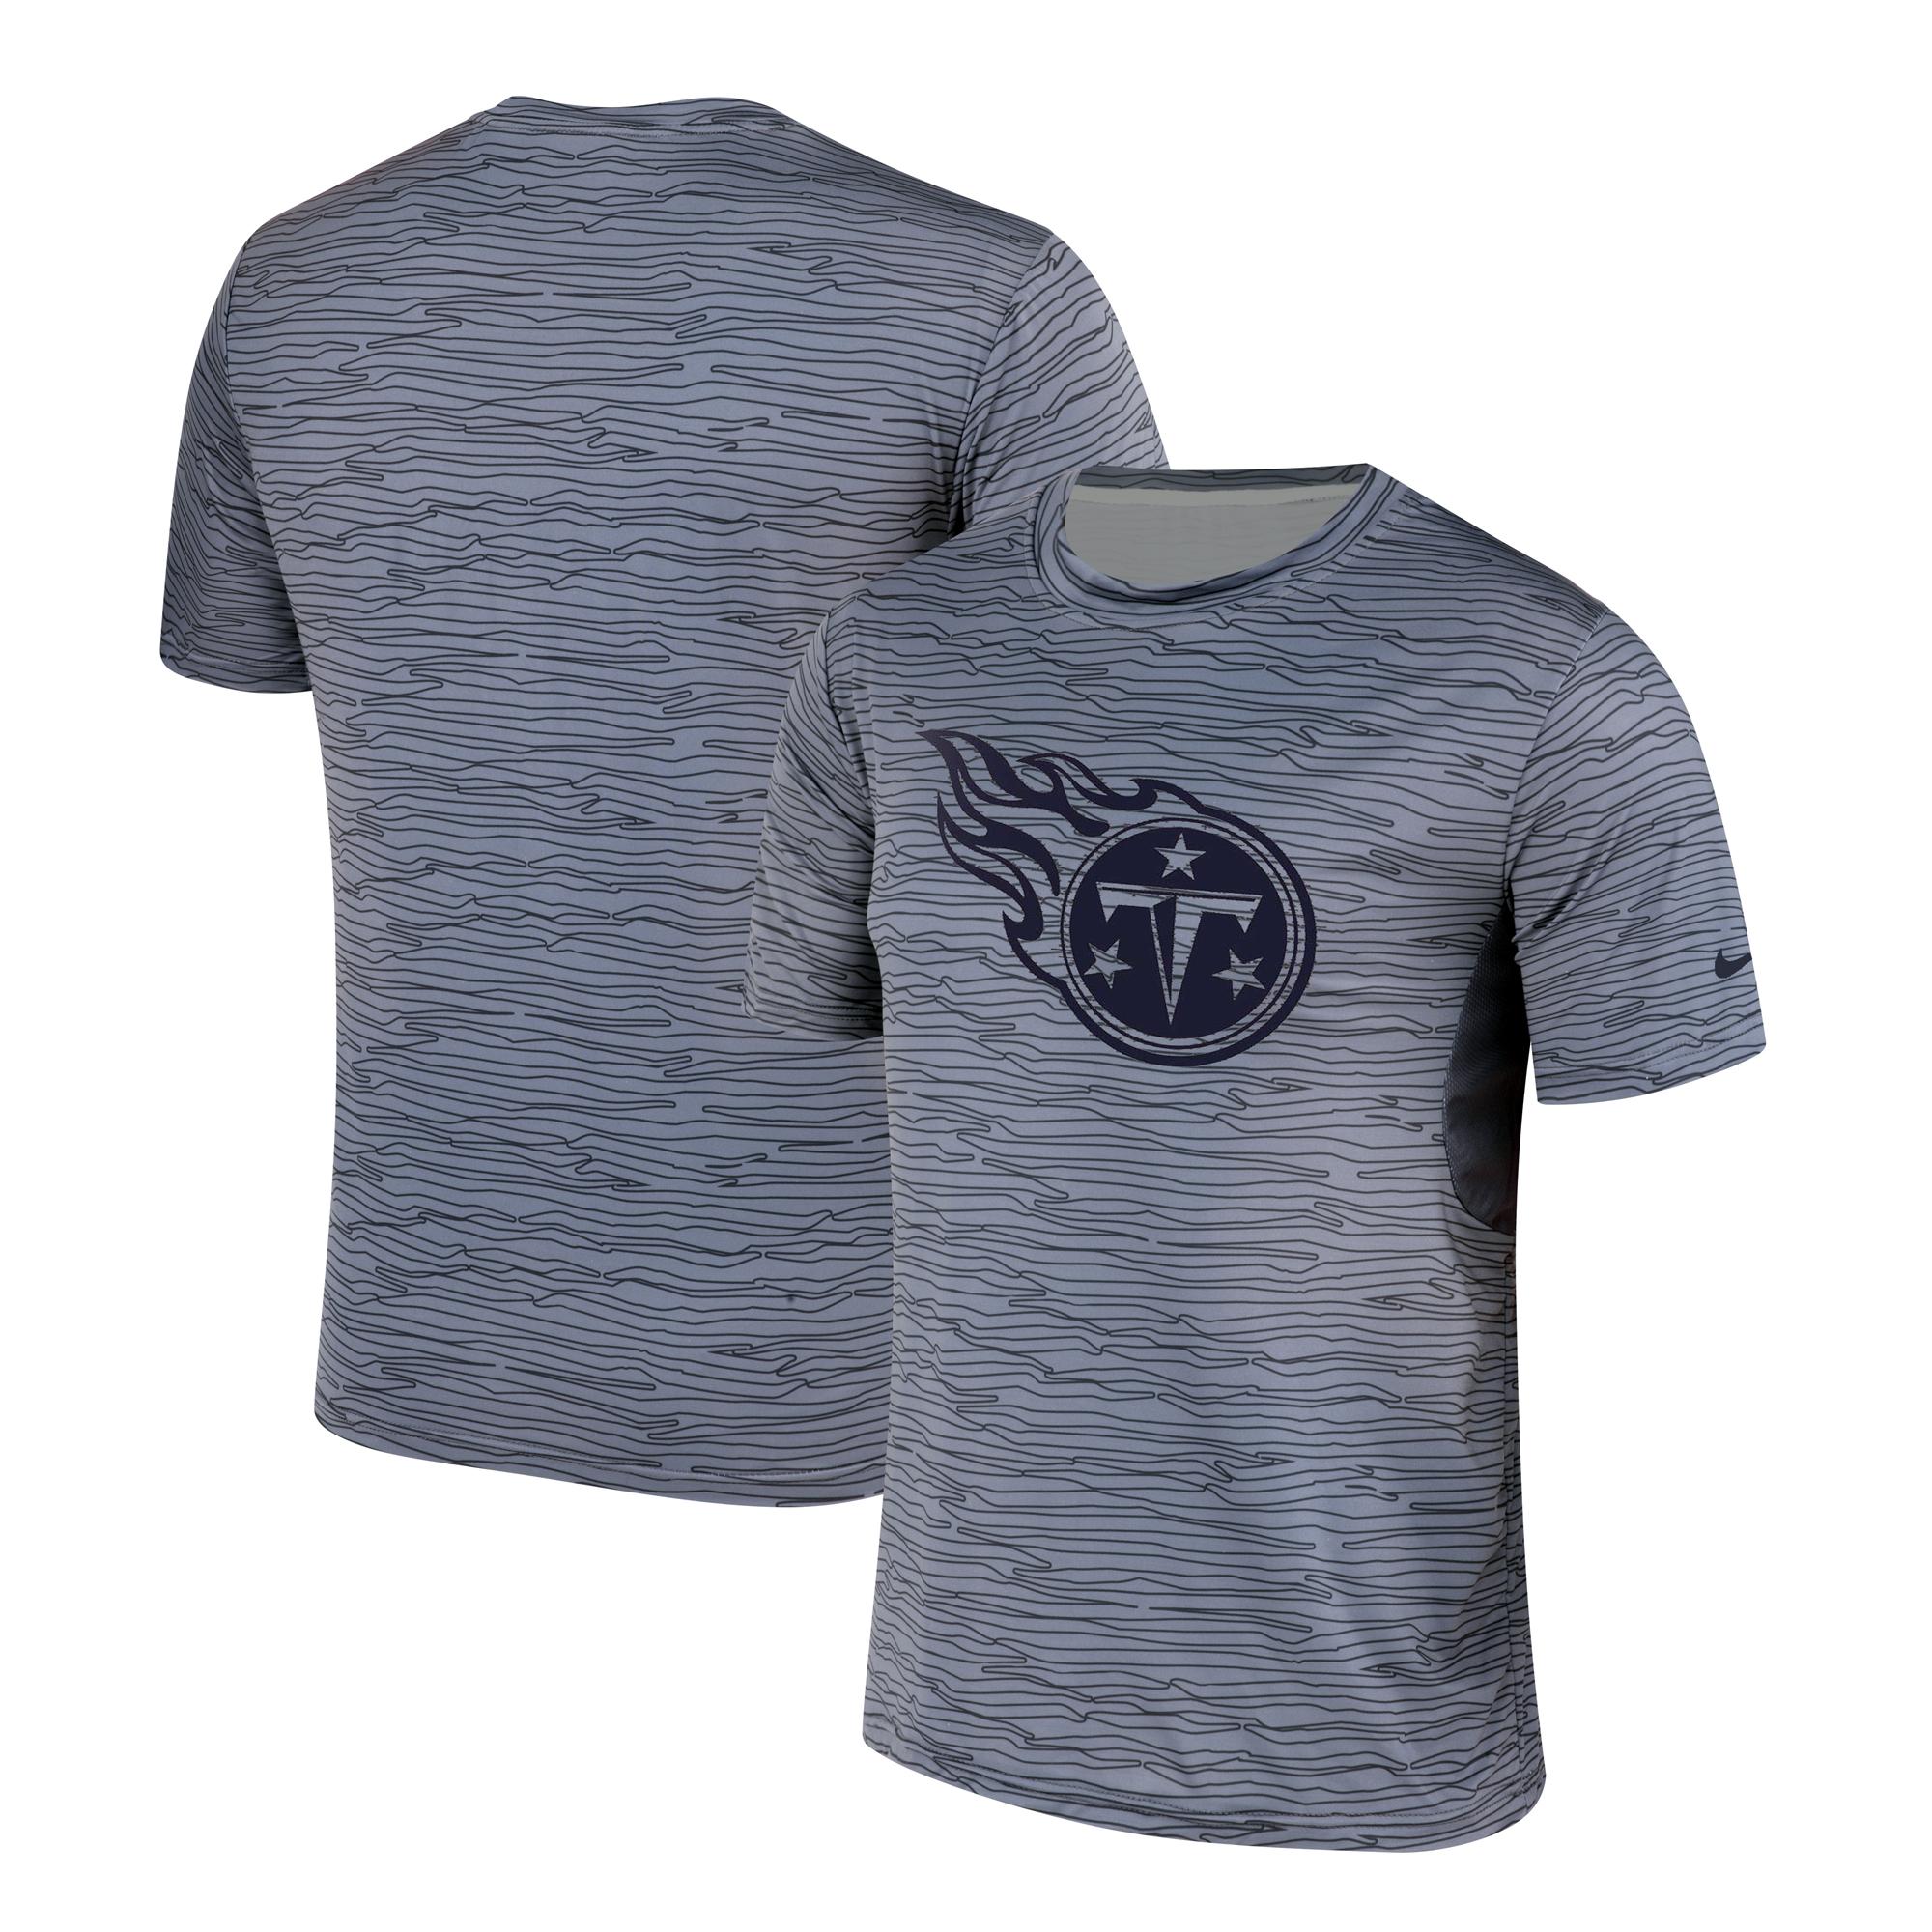 Men's Tennessee Titans Nike Gray Black Striped Logo Performance T-Shirt